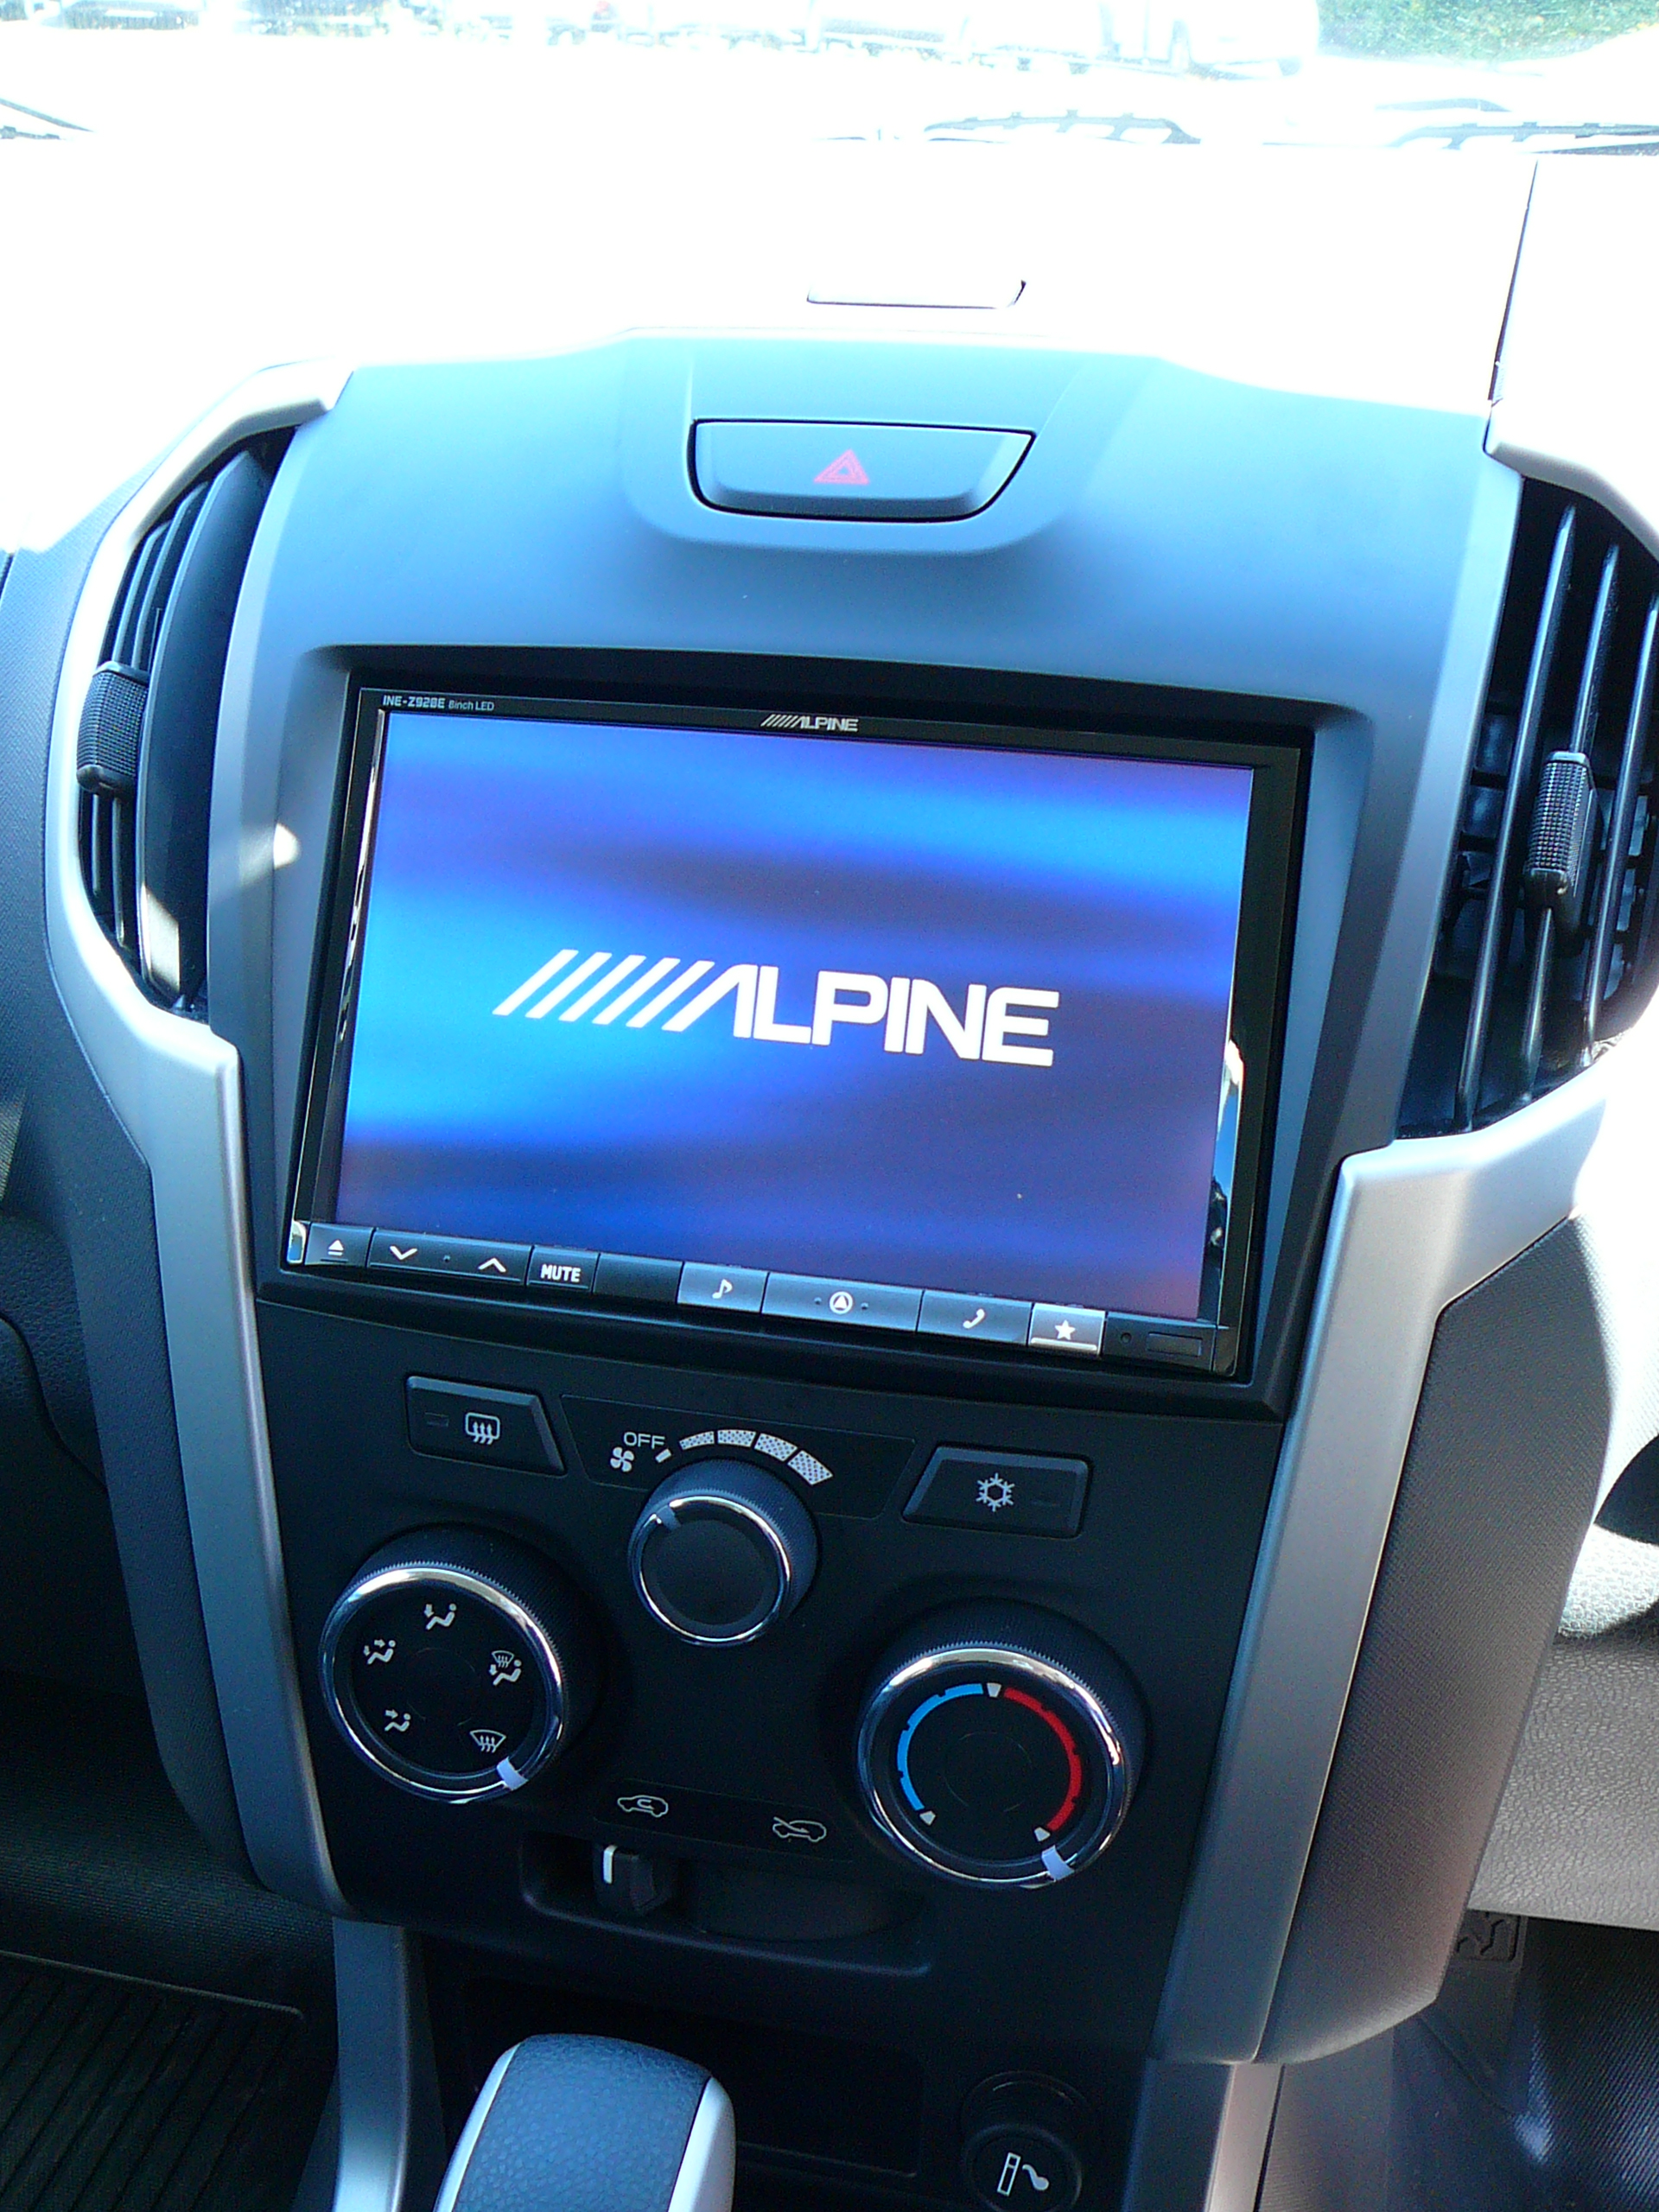 Isuzu D-Max 2013,Alpine INE-W928 8 Inch GPS Navigation & Reverse Camera